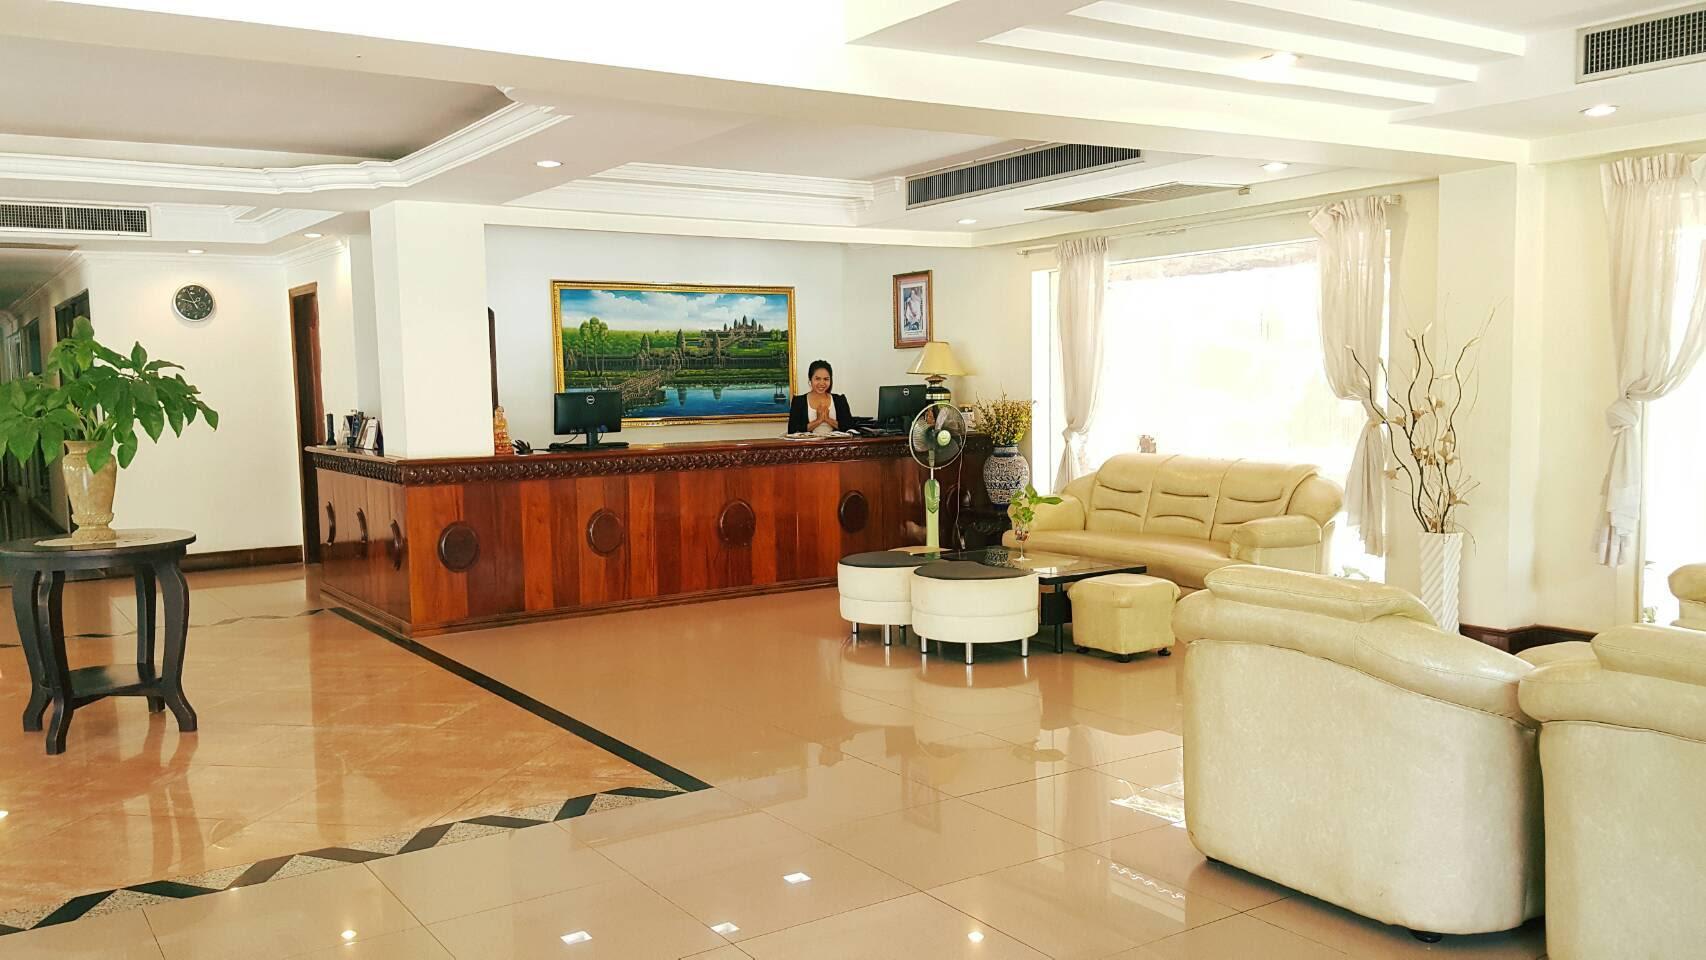 Review Angkor Vireak Chey Hotel